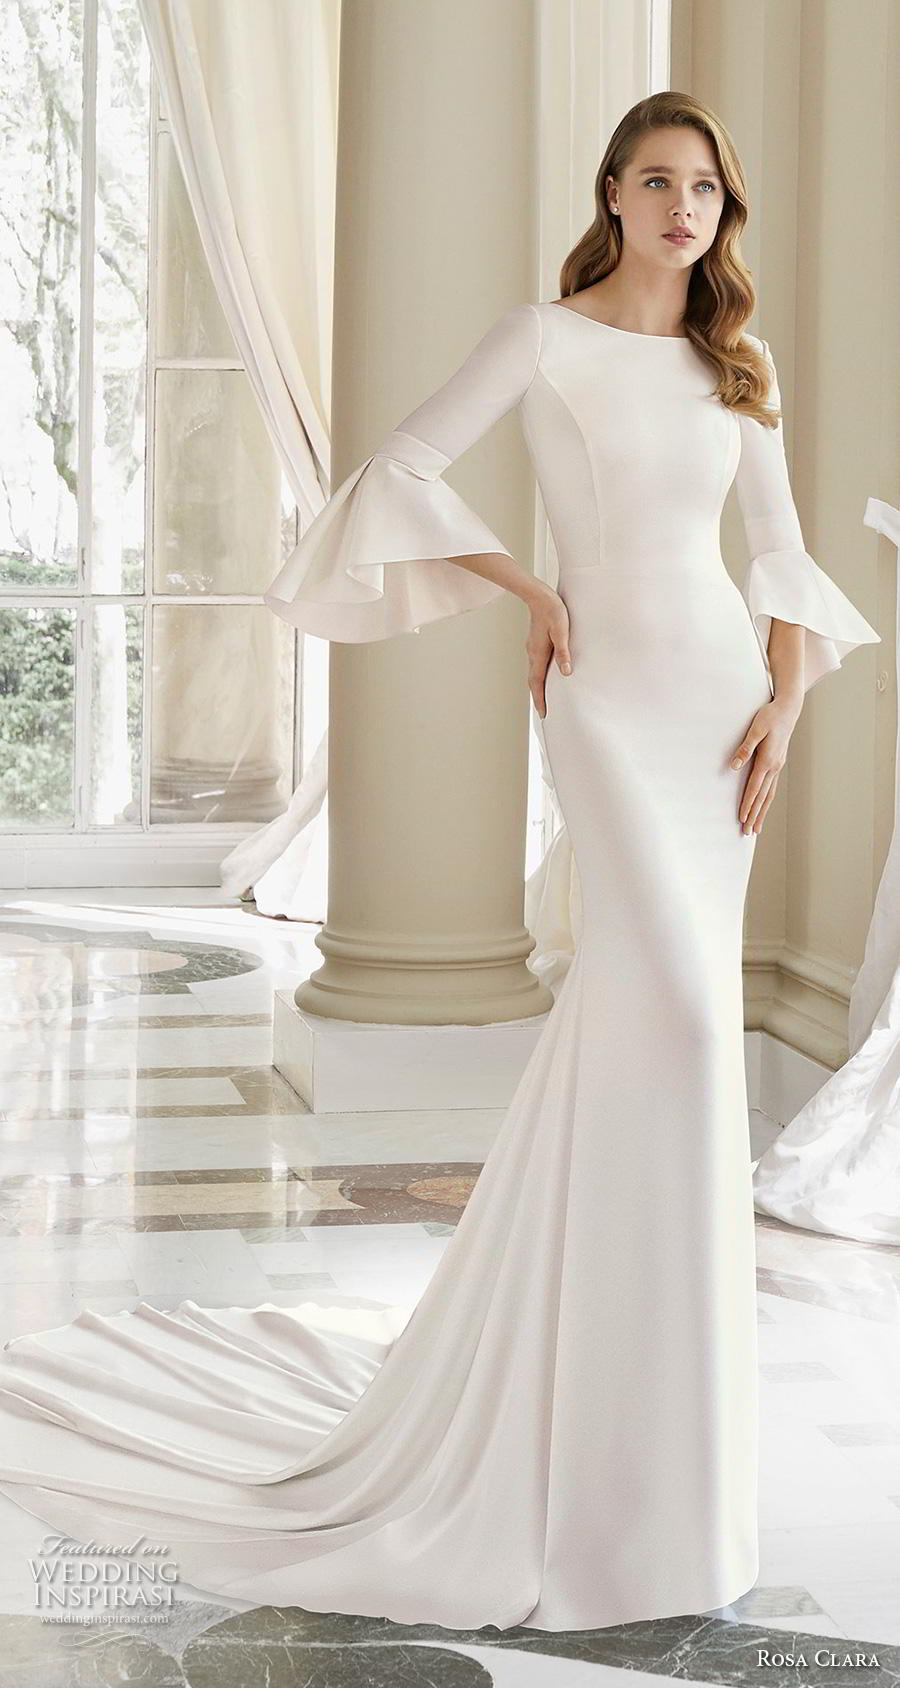 rosa clara 2019 couture bridal long lantern sleeves bateau neckline simple minimalist elegant sheath wedding dress v back chapel train (8) mv